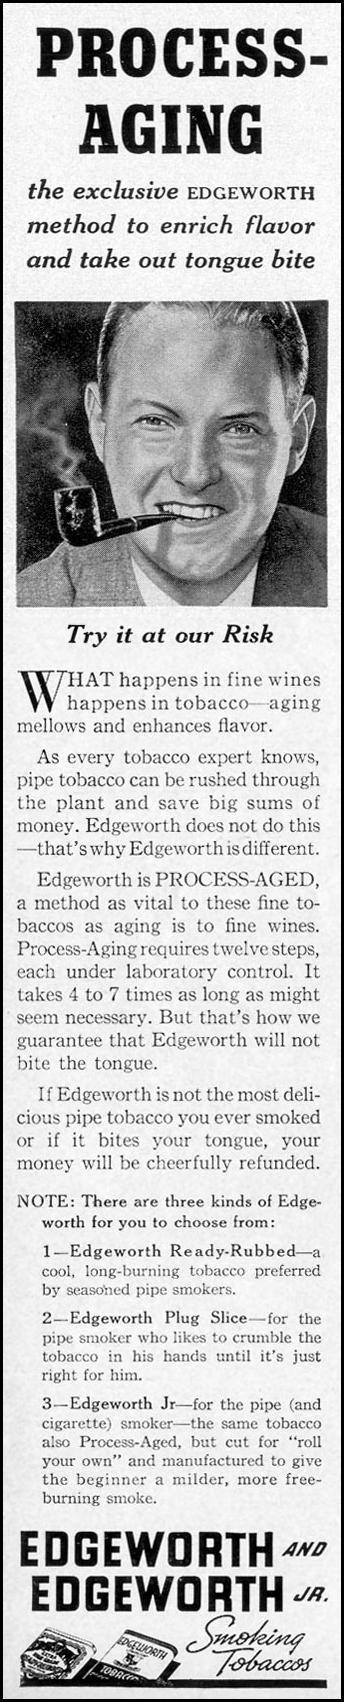 EDGEWORTH AND EDGEWORTH JR. SMOKING TOBACCOS LIFE 07/26/1937 p. 88